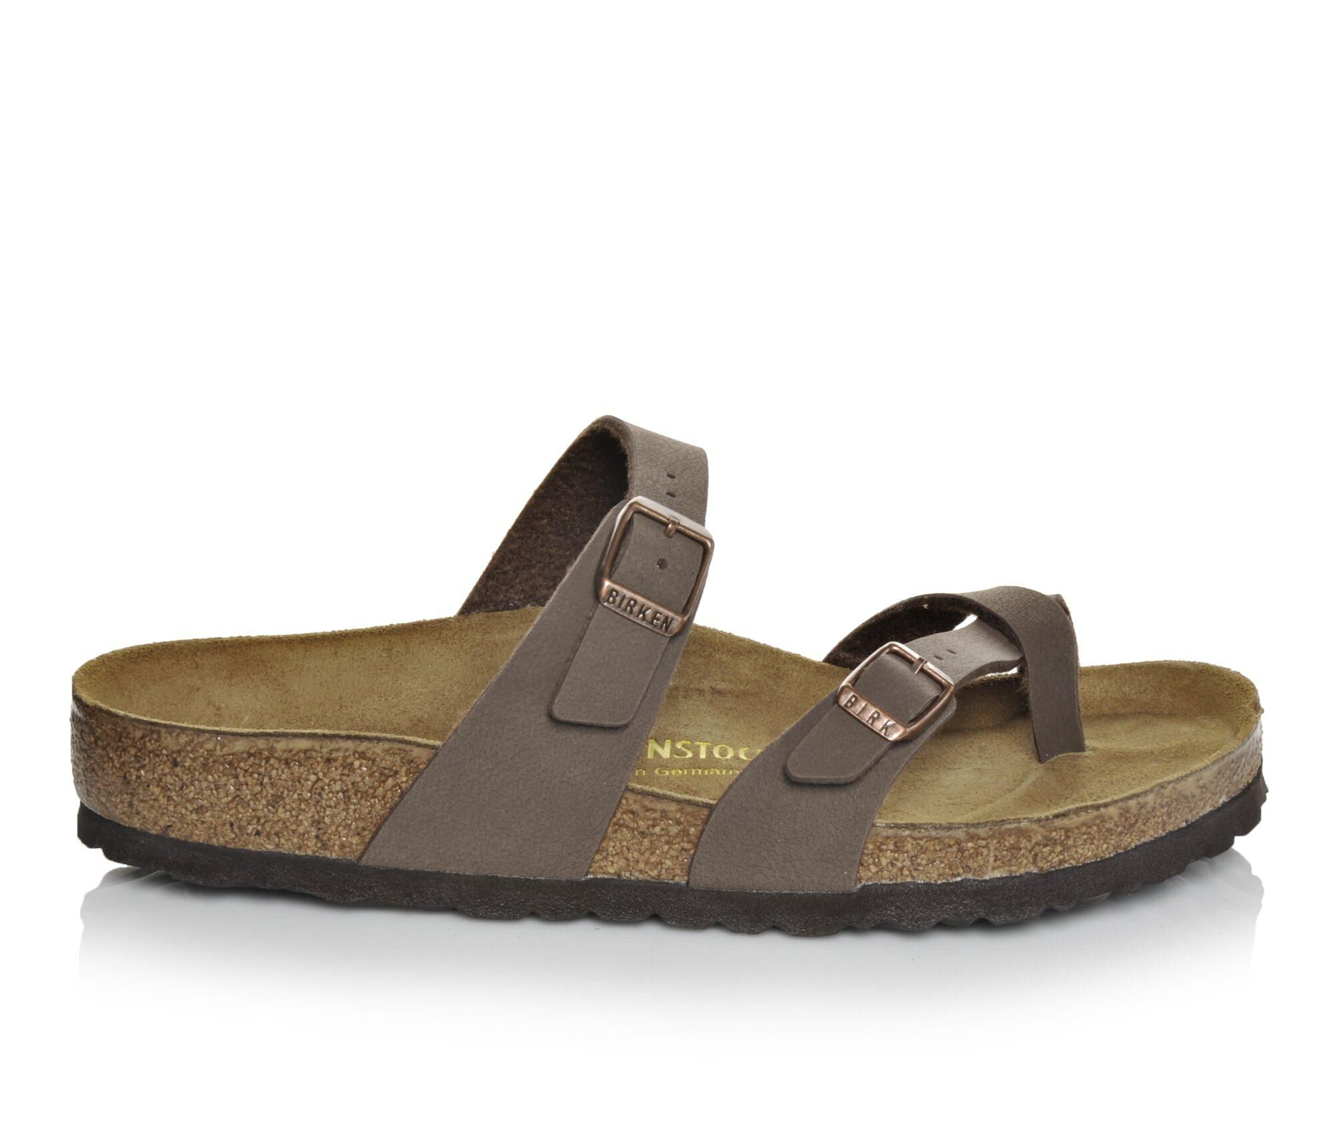 Women's Birkenstock Mayari Footbed Sandals Mocha